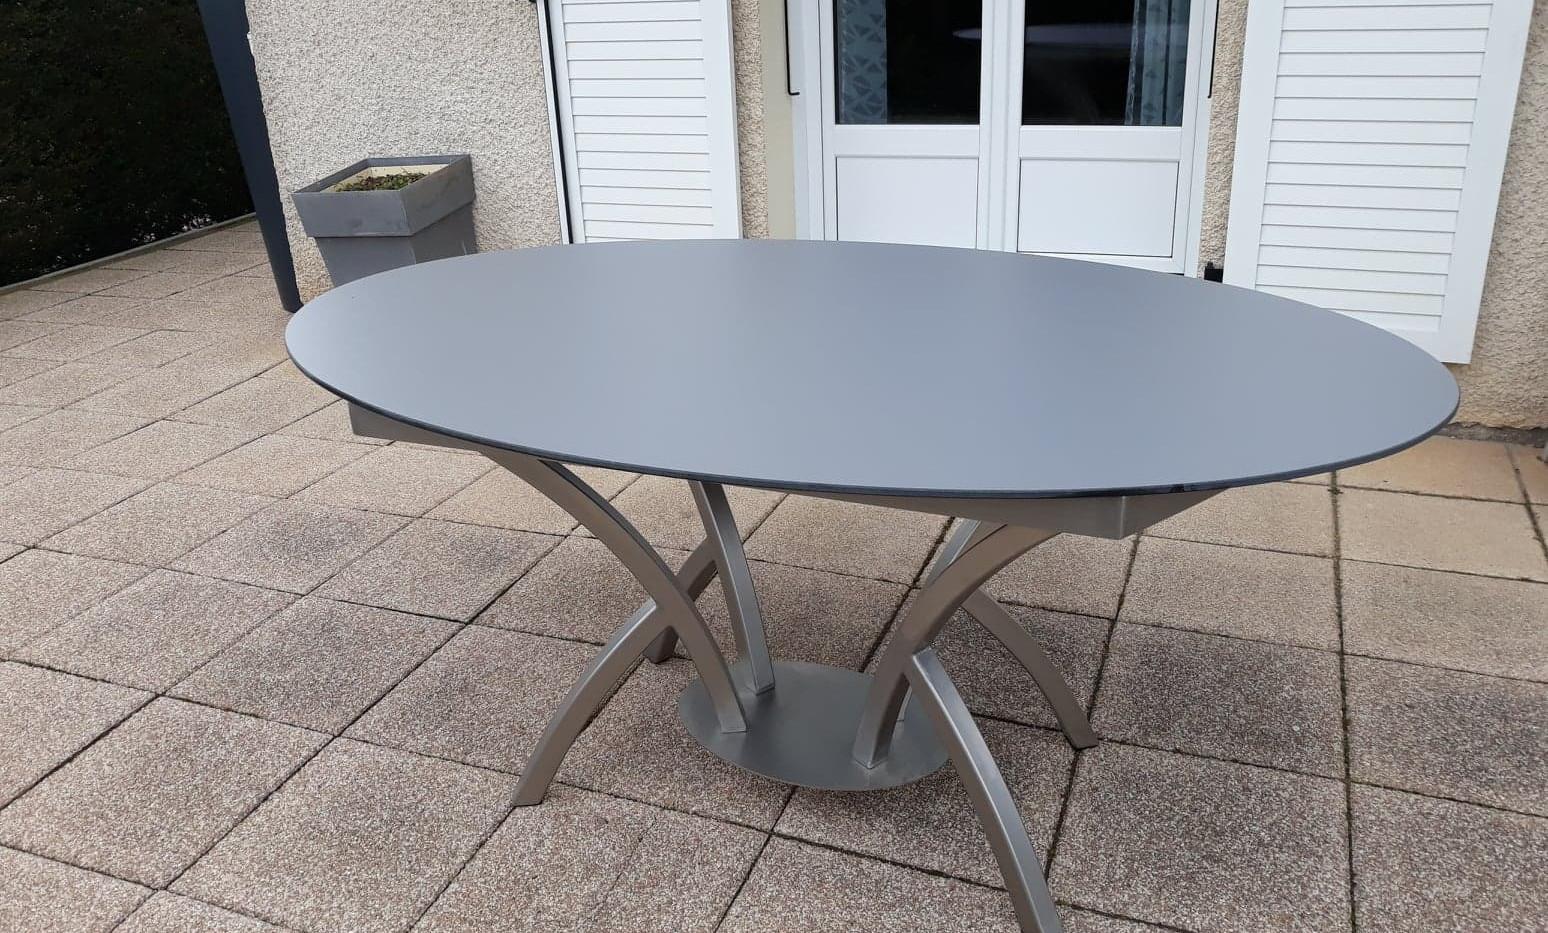 Table ovale pied central centré inox